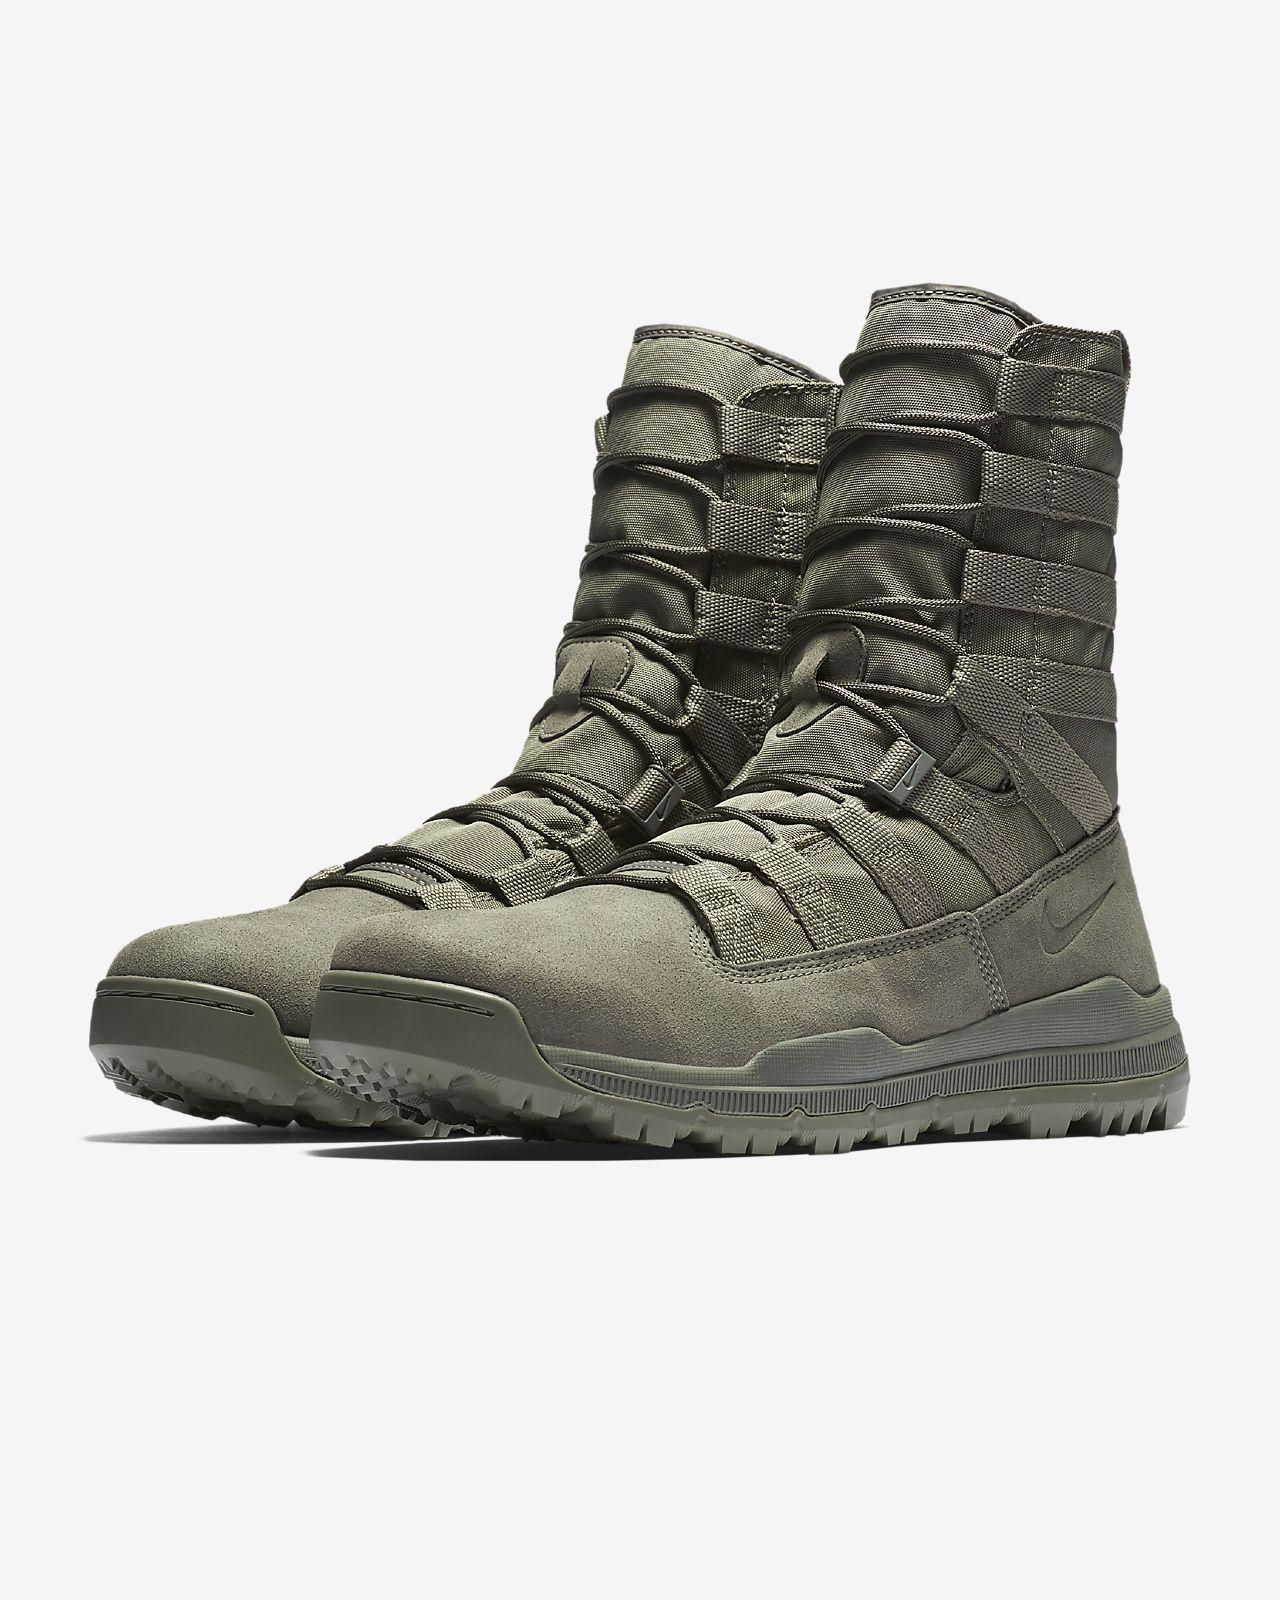 nike sfb canvas boots